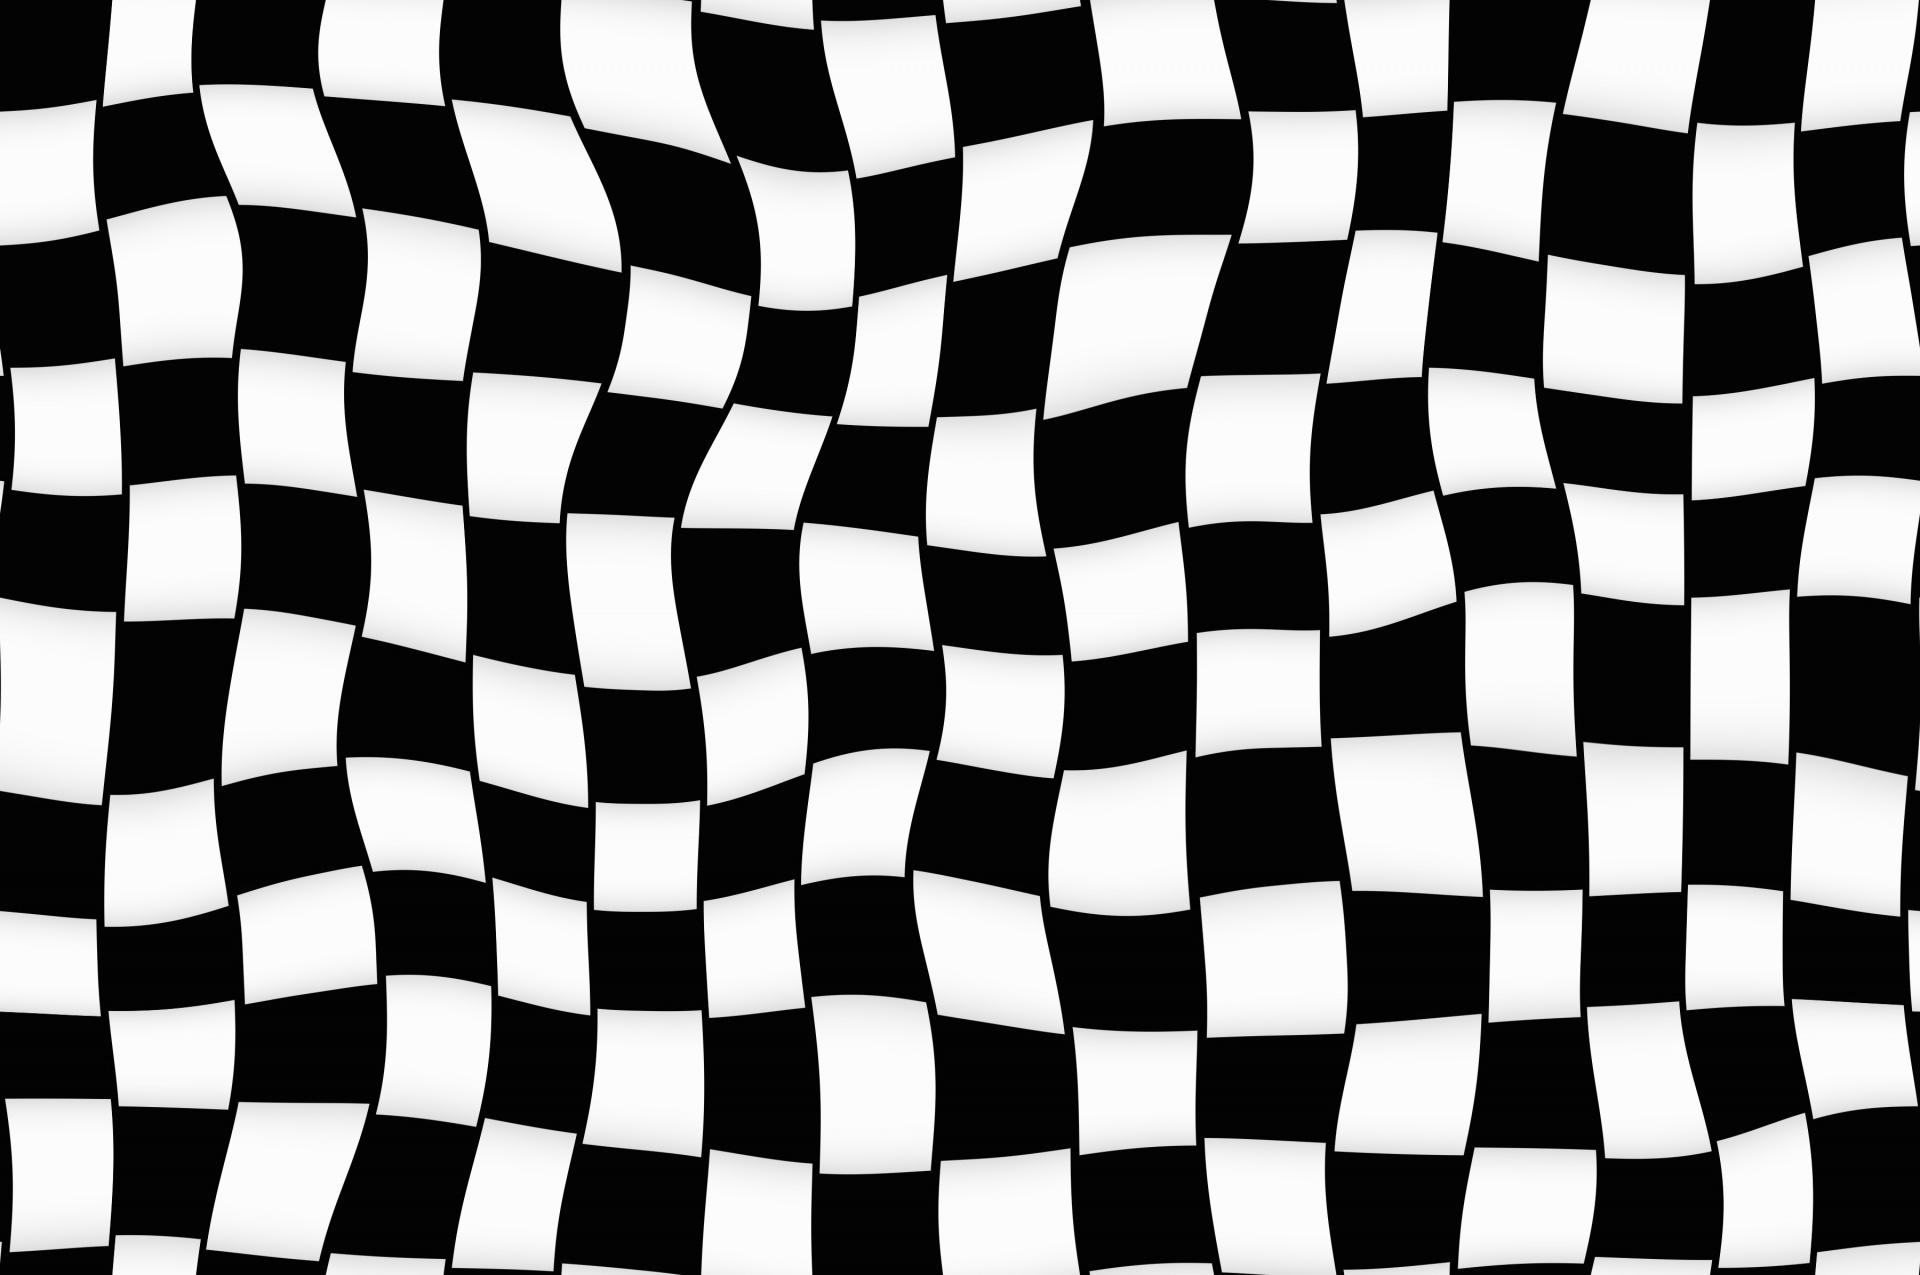 Black White Cubes Block Wallpaper Free Image From Needpix Com